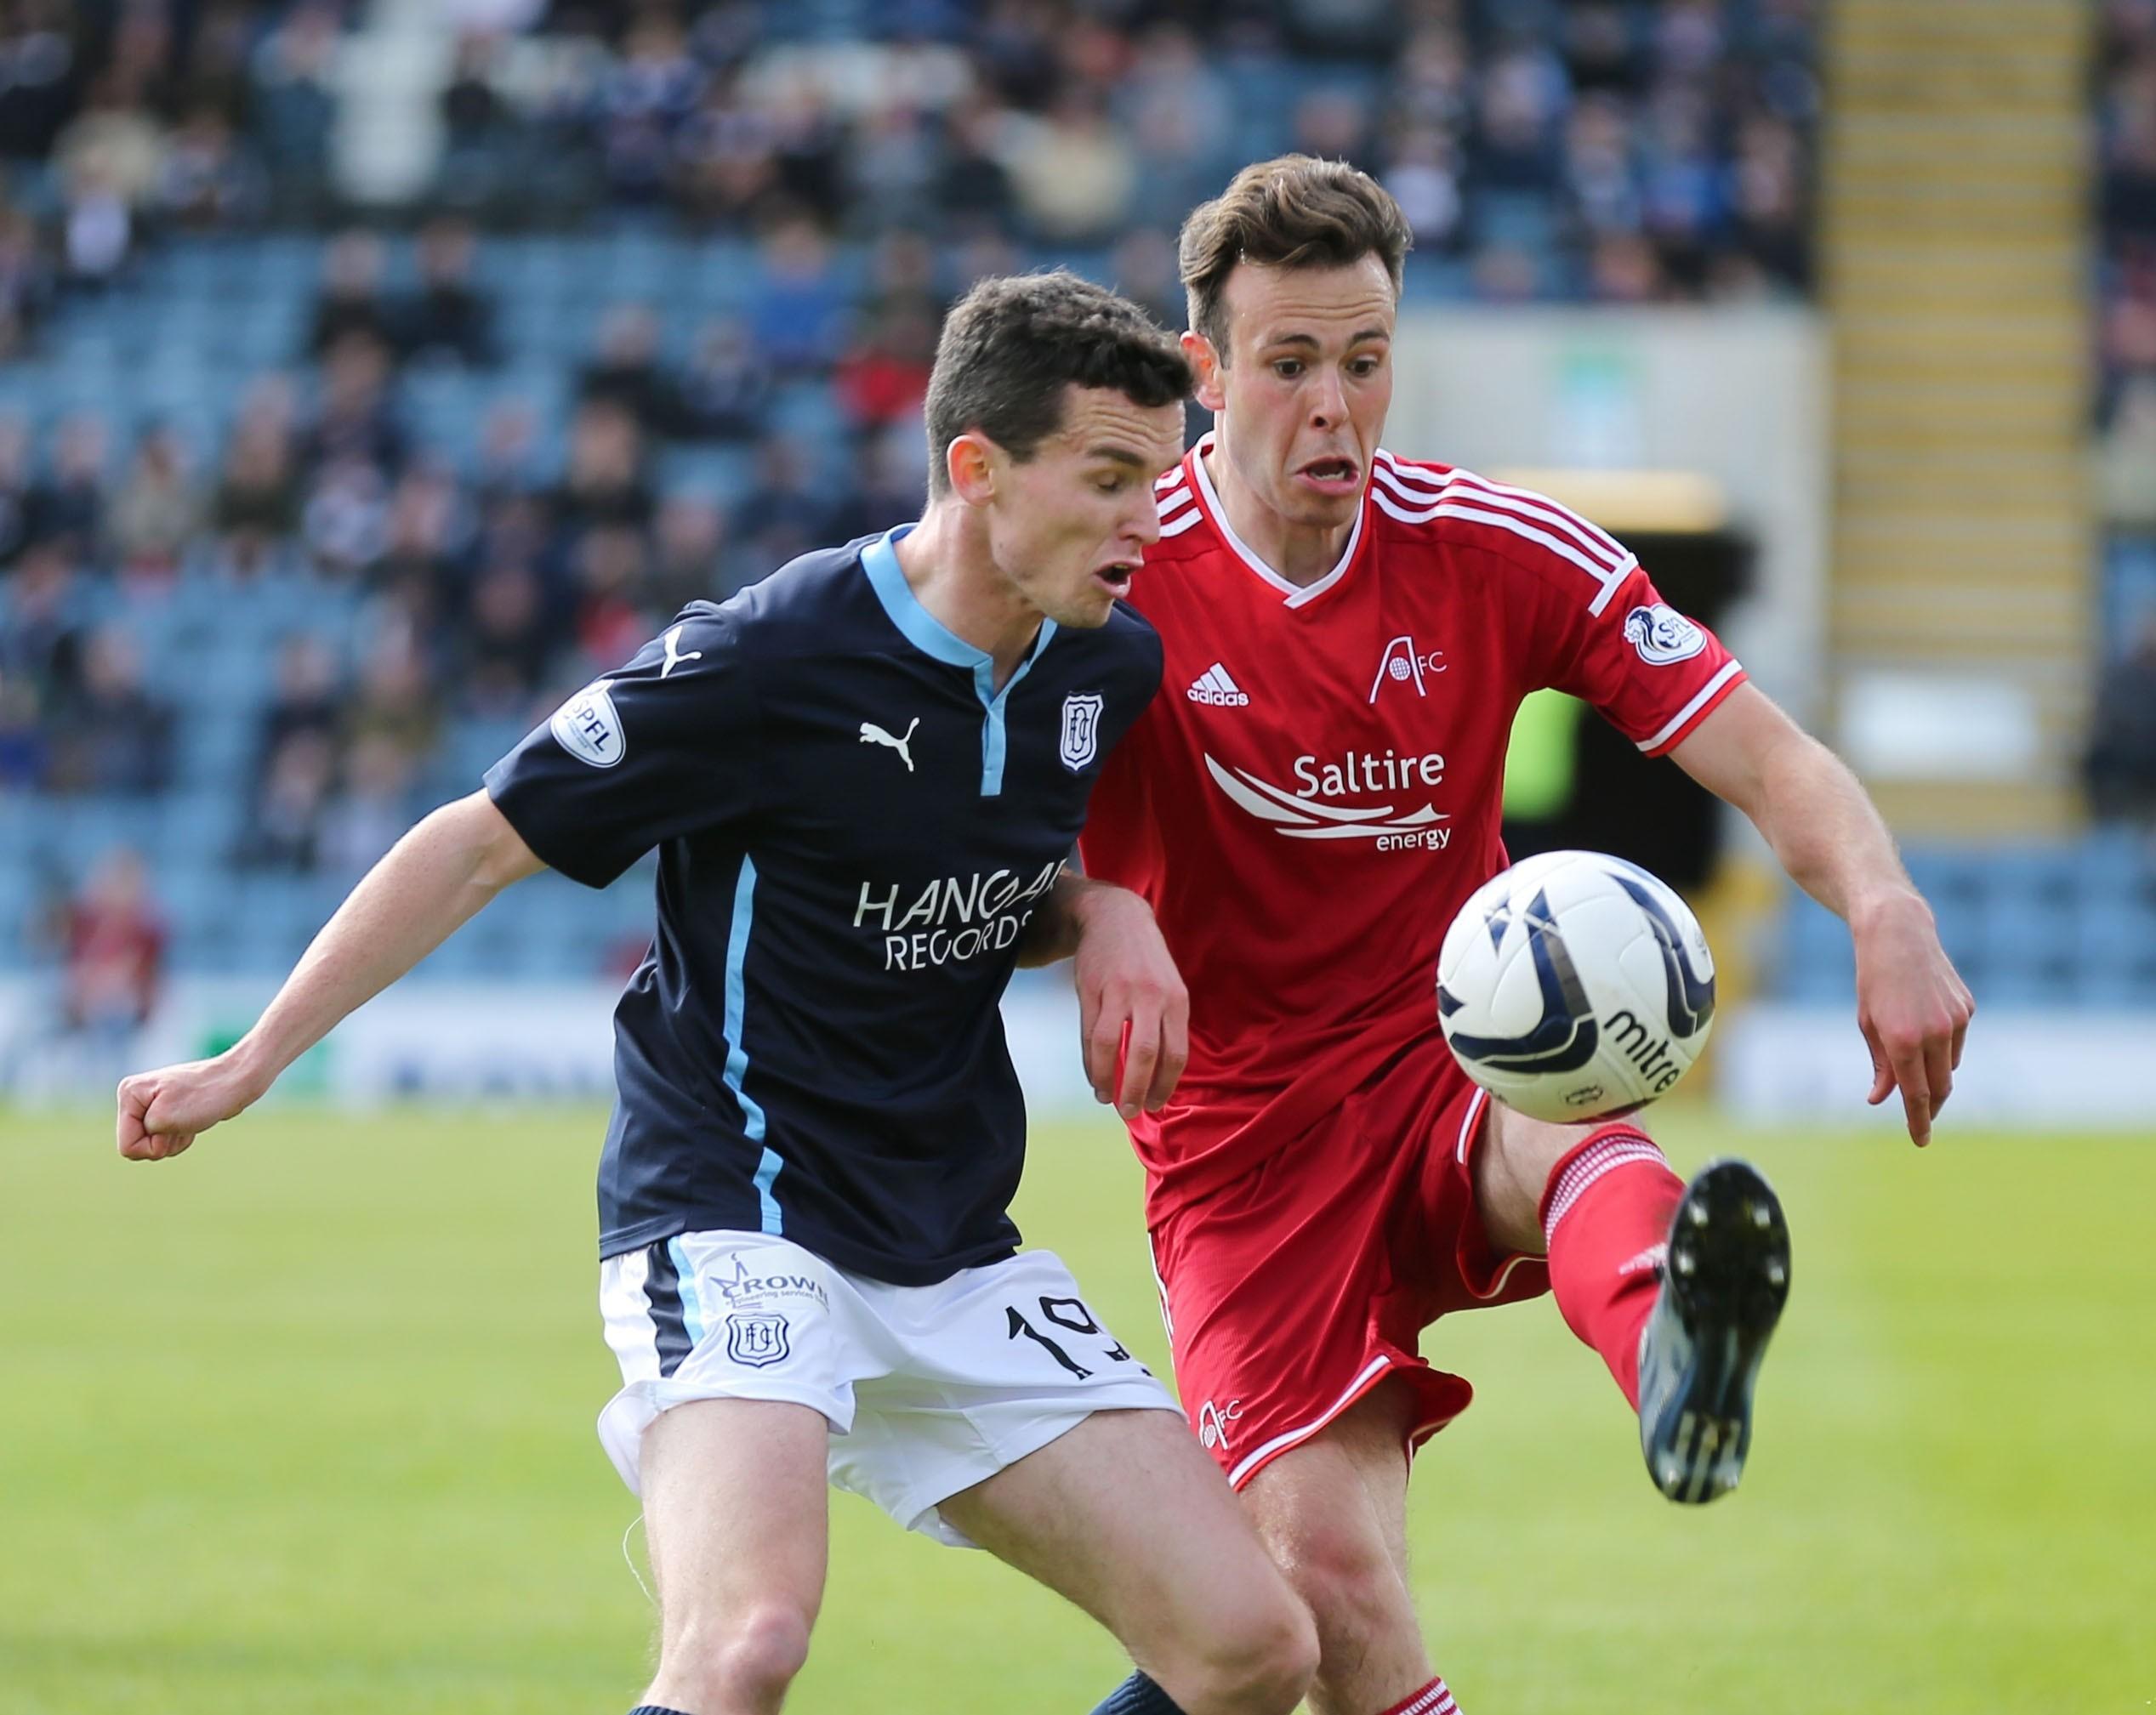 Dundee defender Paul McGinn challenges Andrew Considine